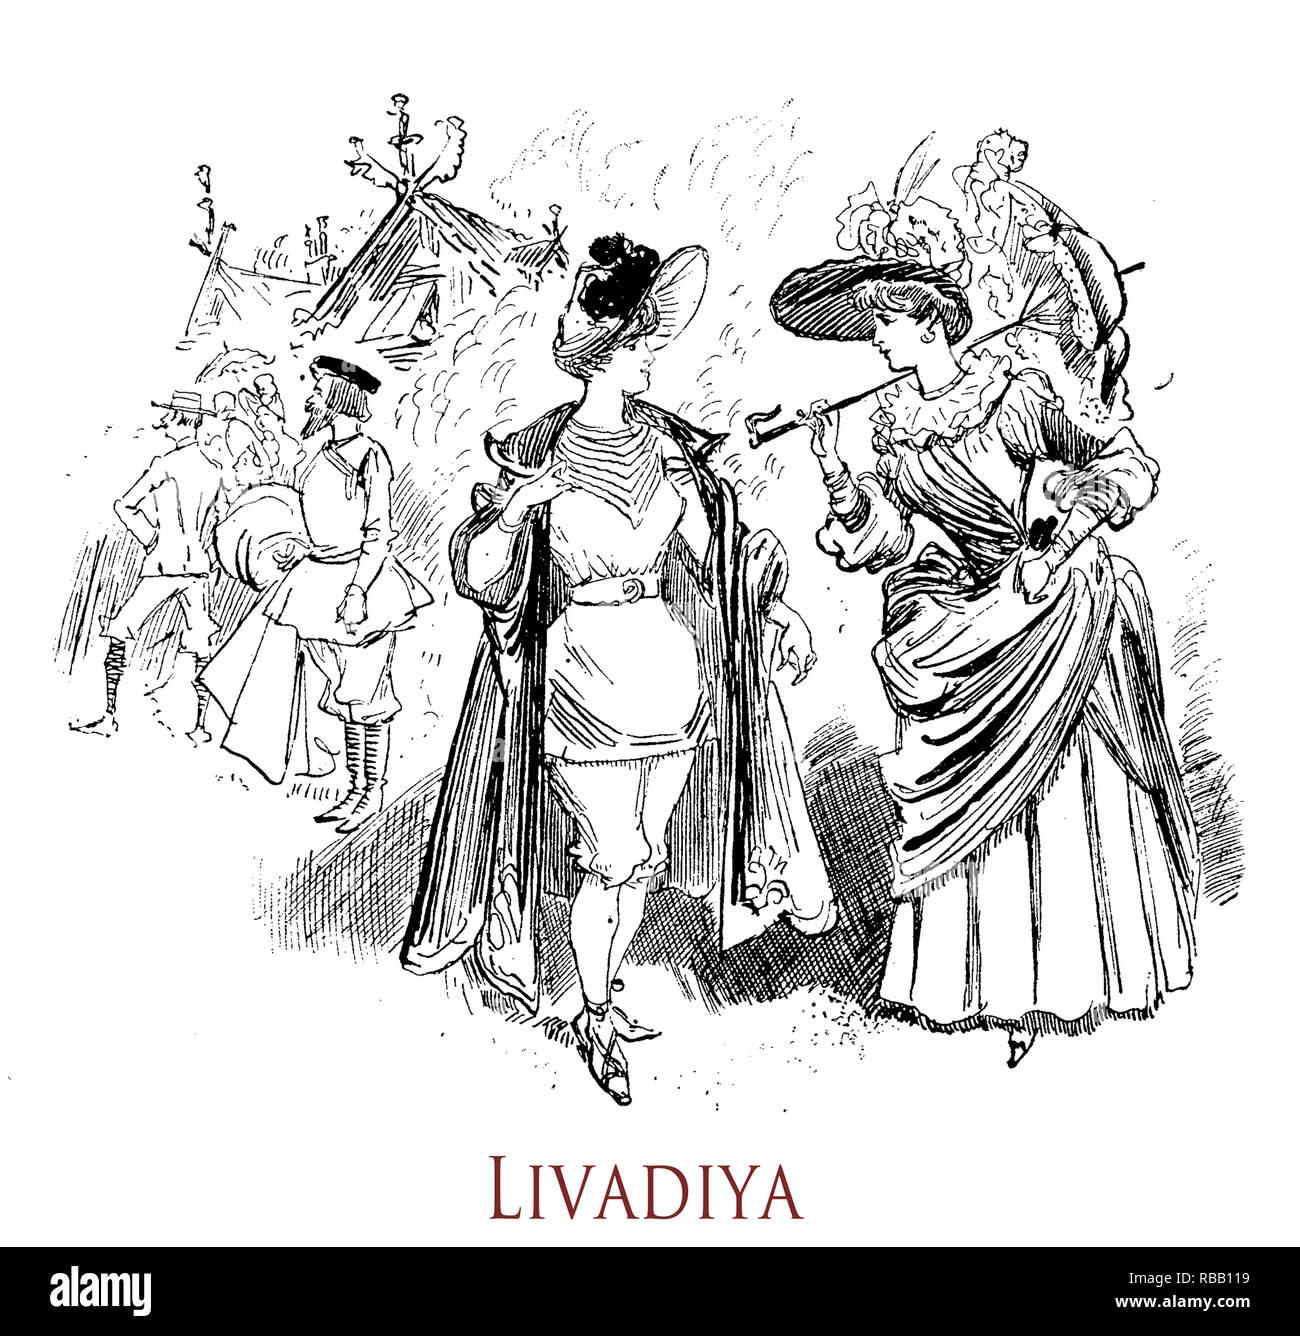 Vintage humor and fun: summer vacation on the sea at Livadiya, Crimea. 'La vie Parisienne' French satirical magazine, year 1888 - Stock Image